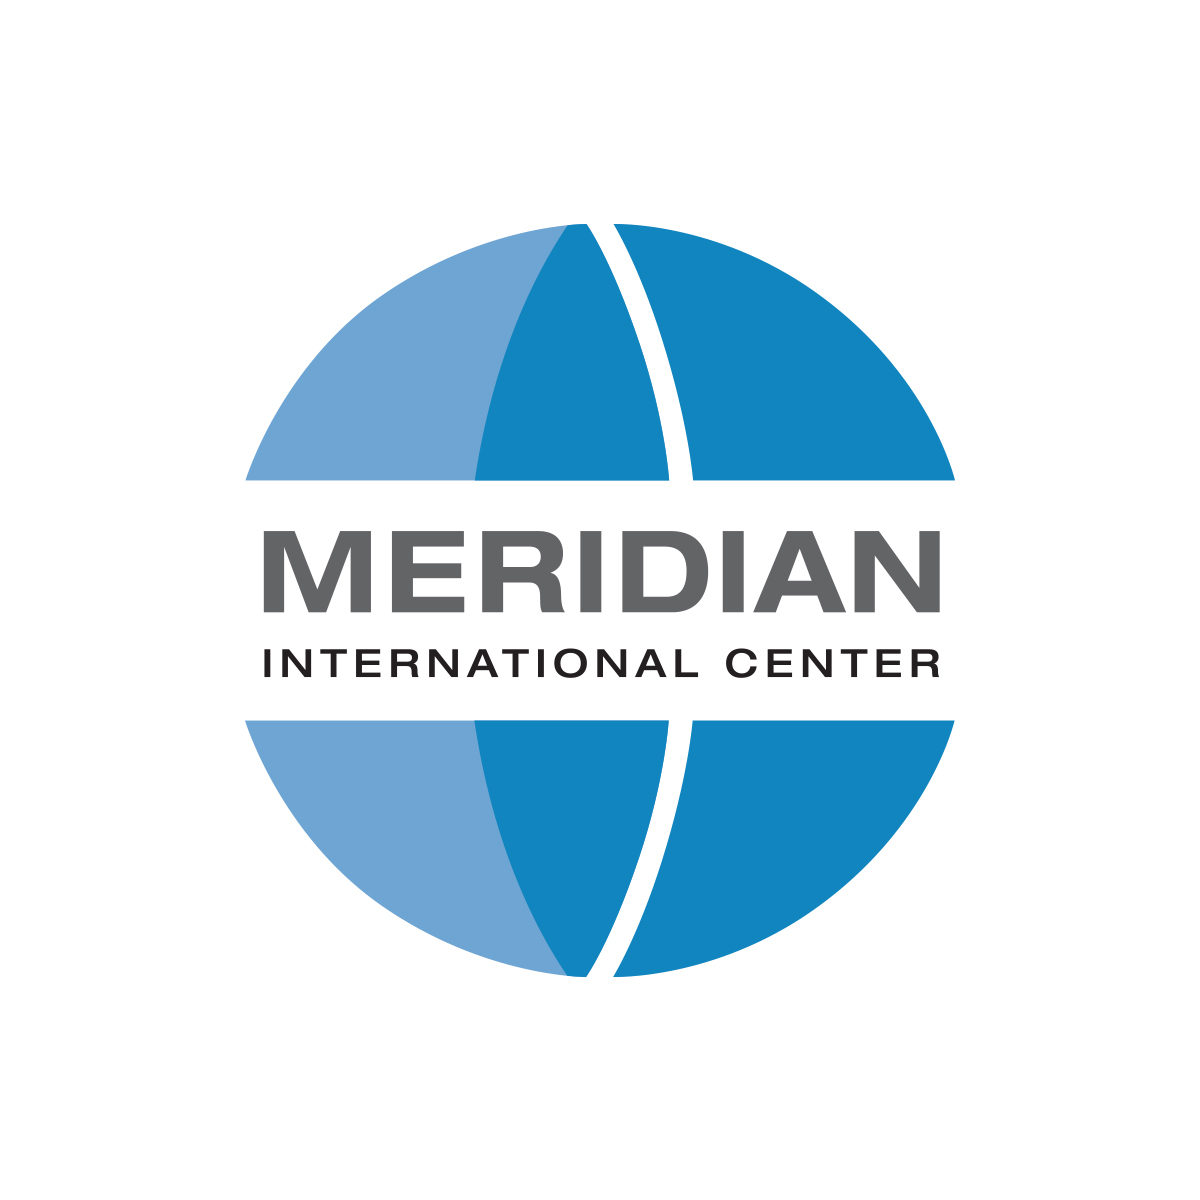 Meridian_logo-color-RBG.jpg